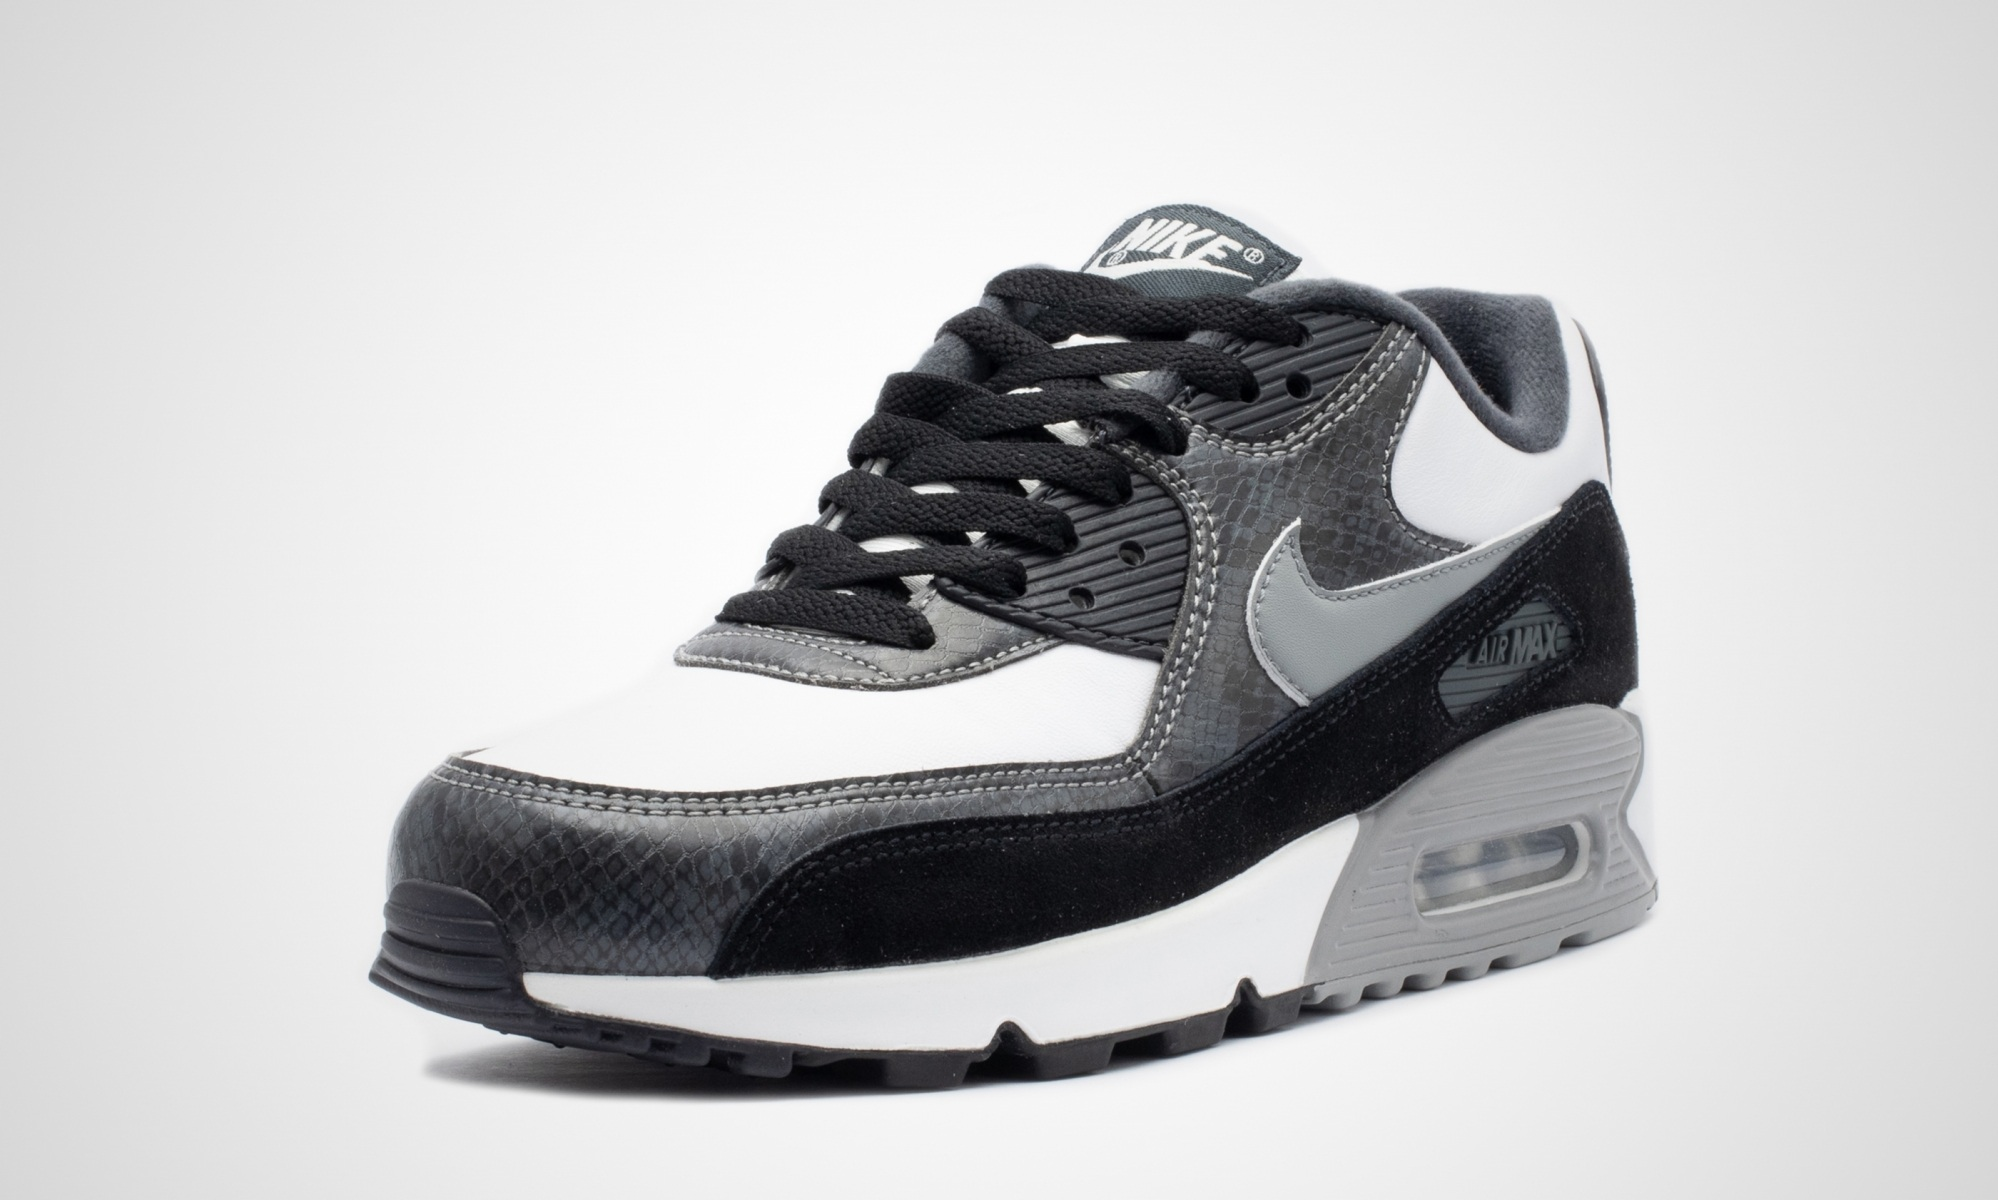 Nike Air Max 90 Python | Dead Stock Sneakerblog